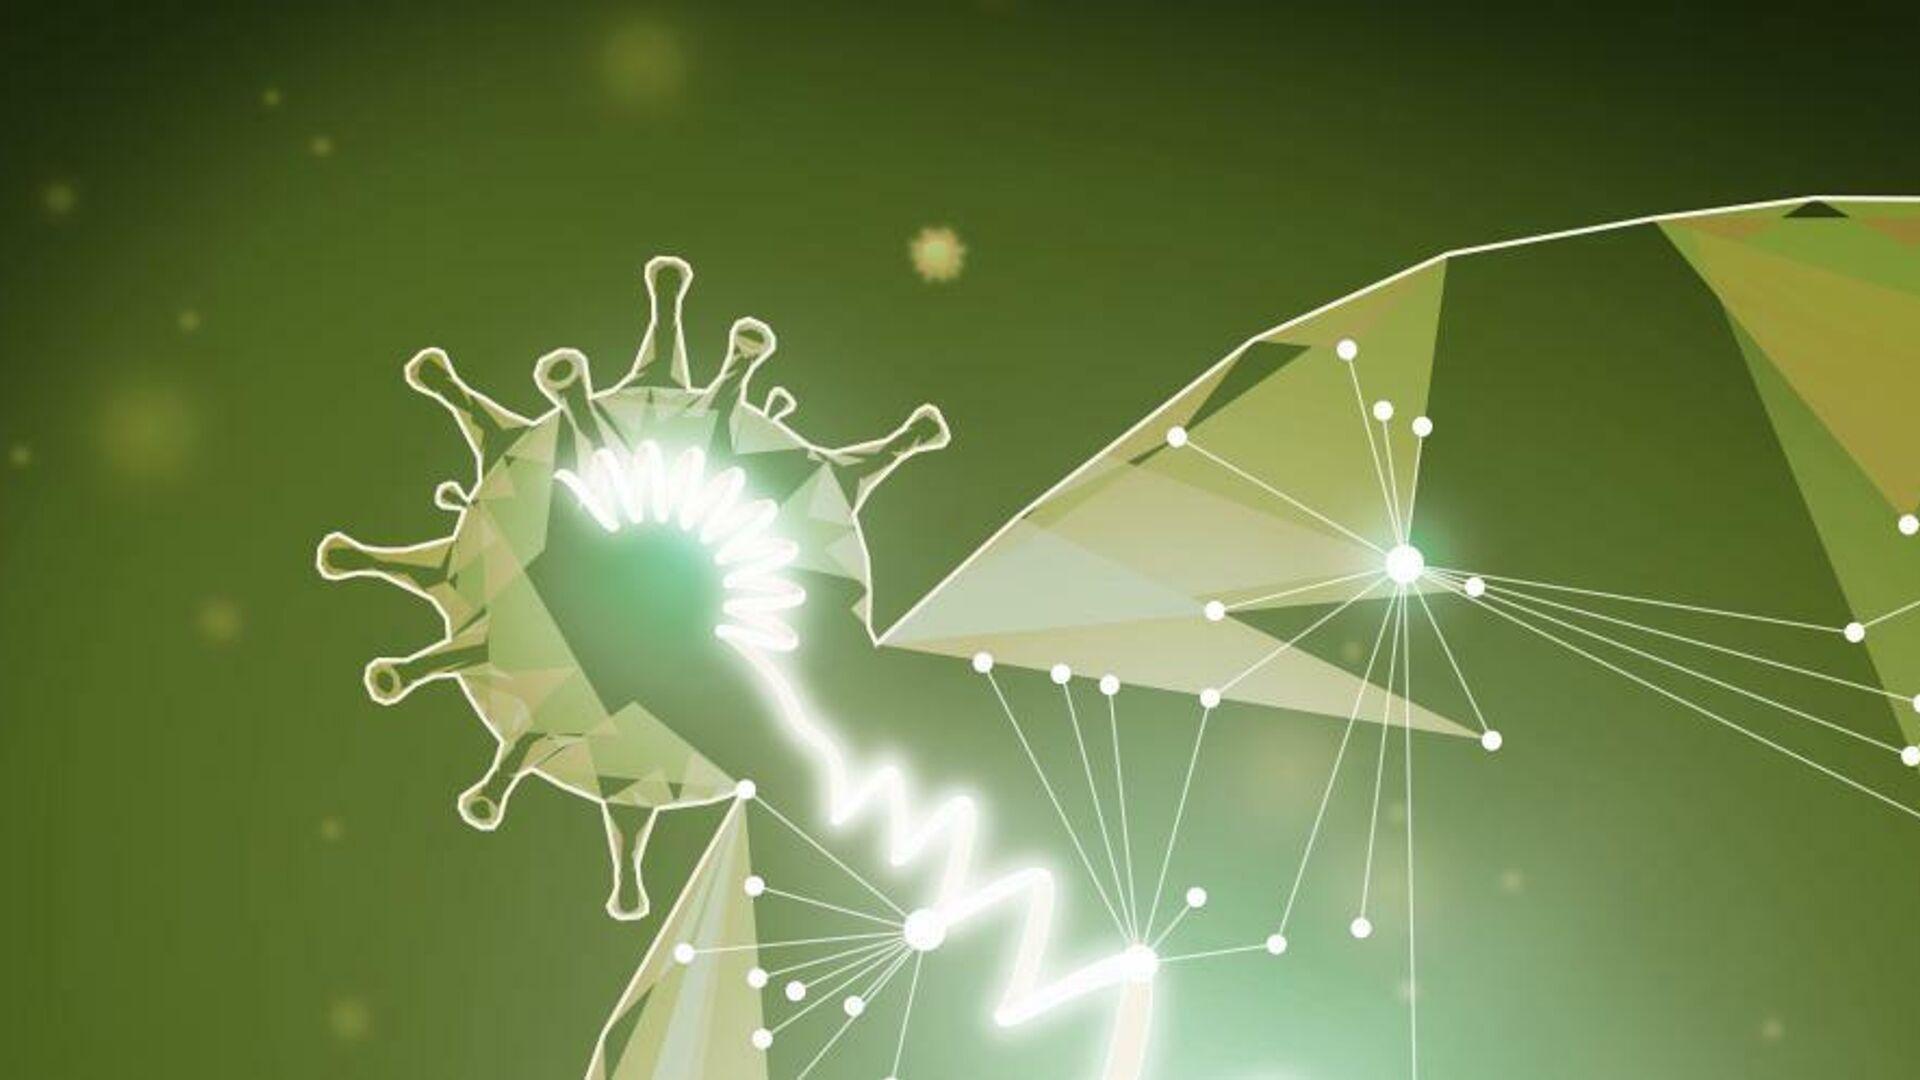 Взаимодействие вируса SARS-CoV-2 с клетками-хозяевами - РИА Новости, 1920, 04.02.2021